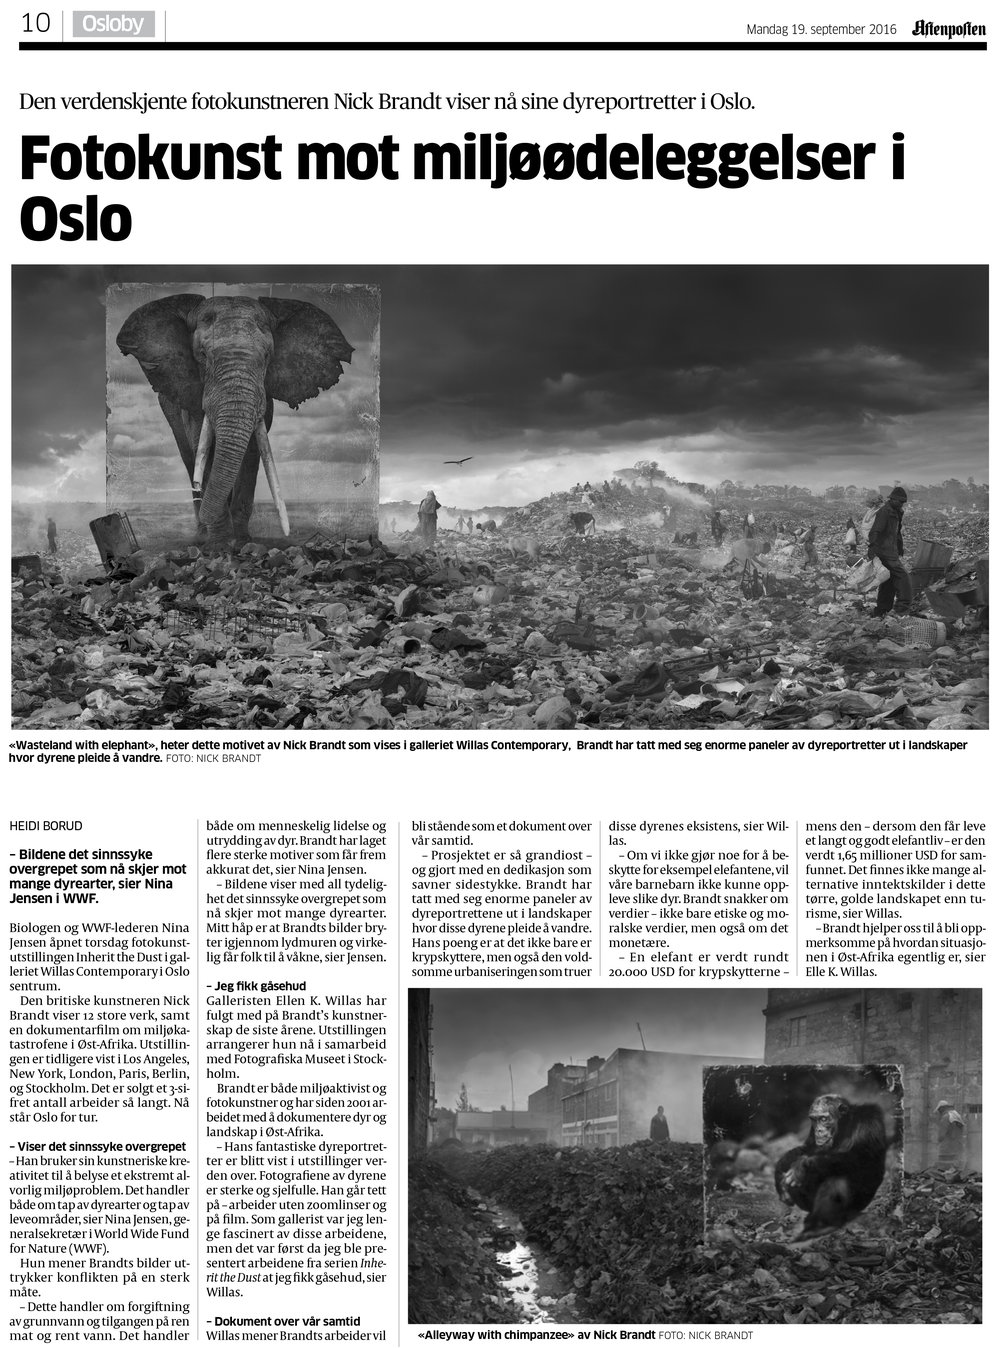 Inherit the Dust featured in Aftenposten